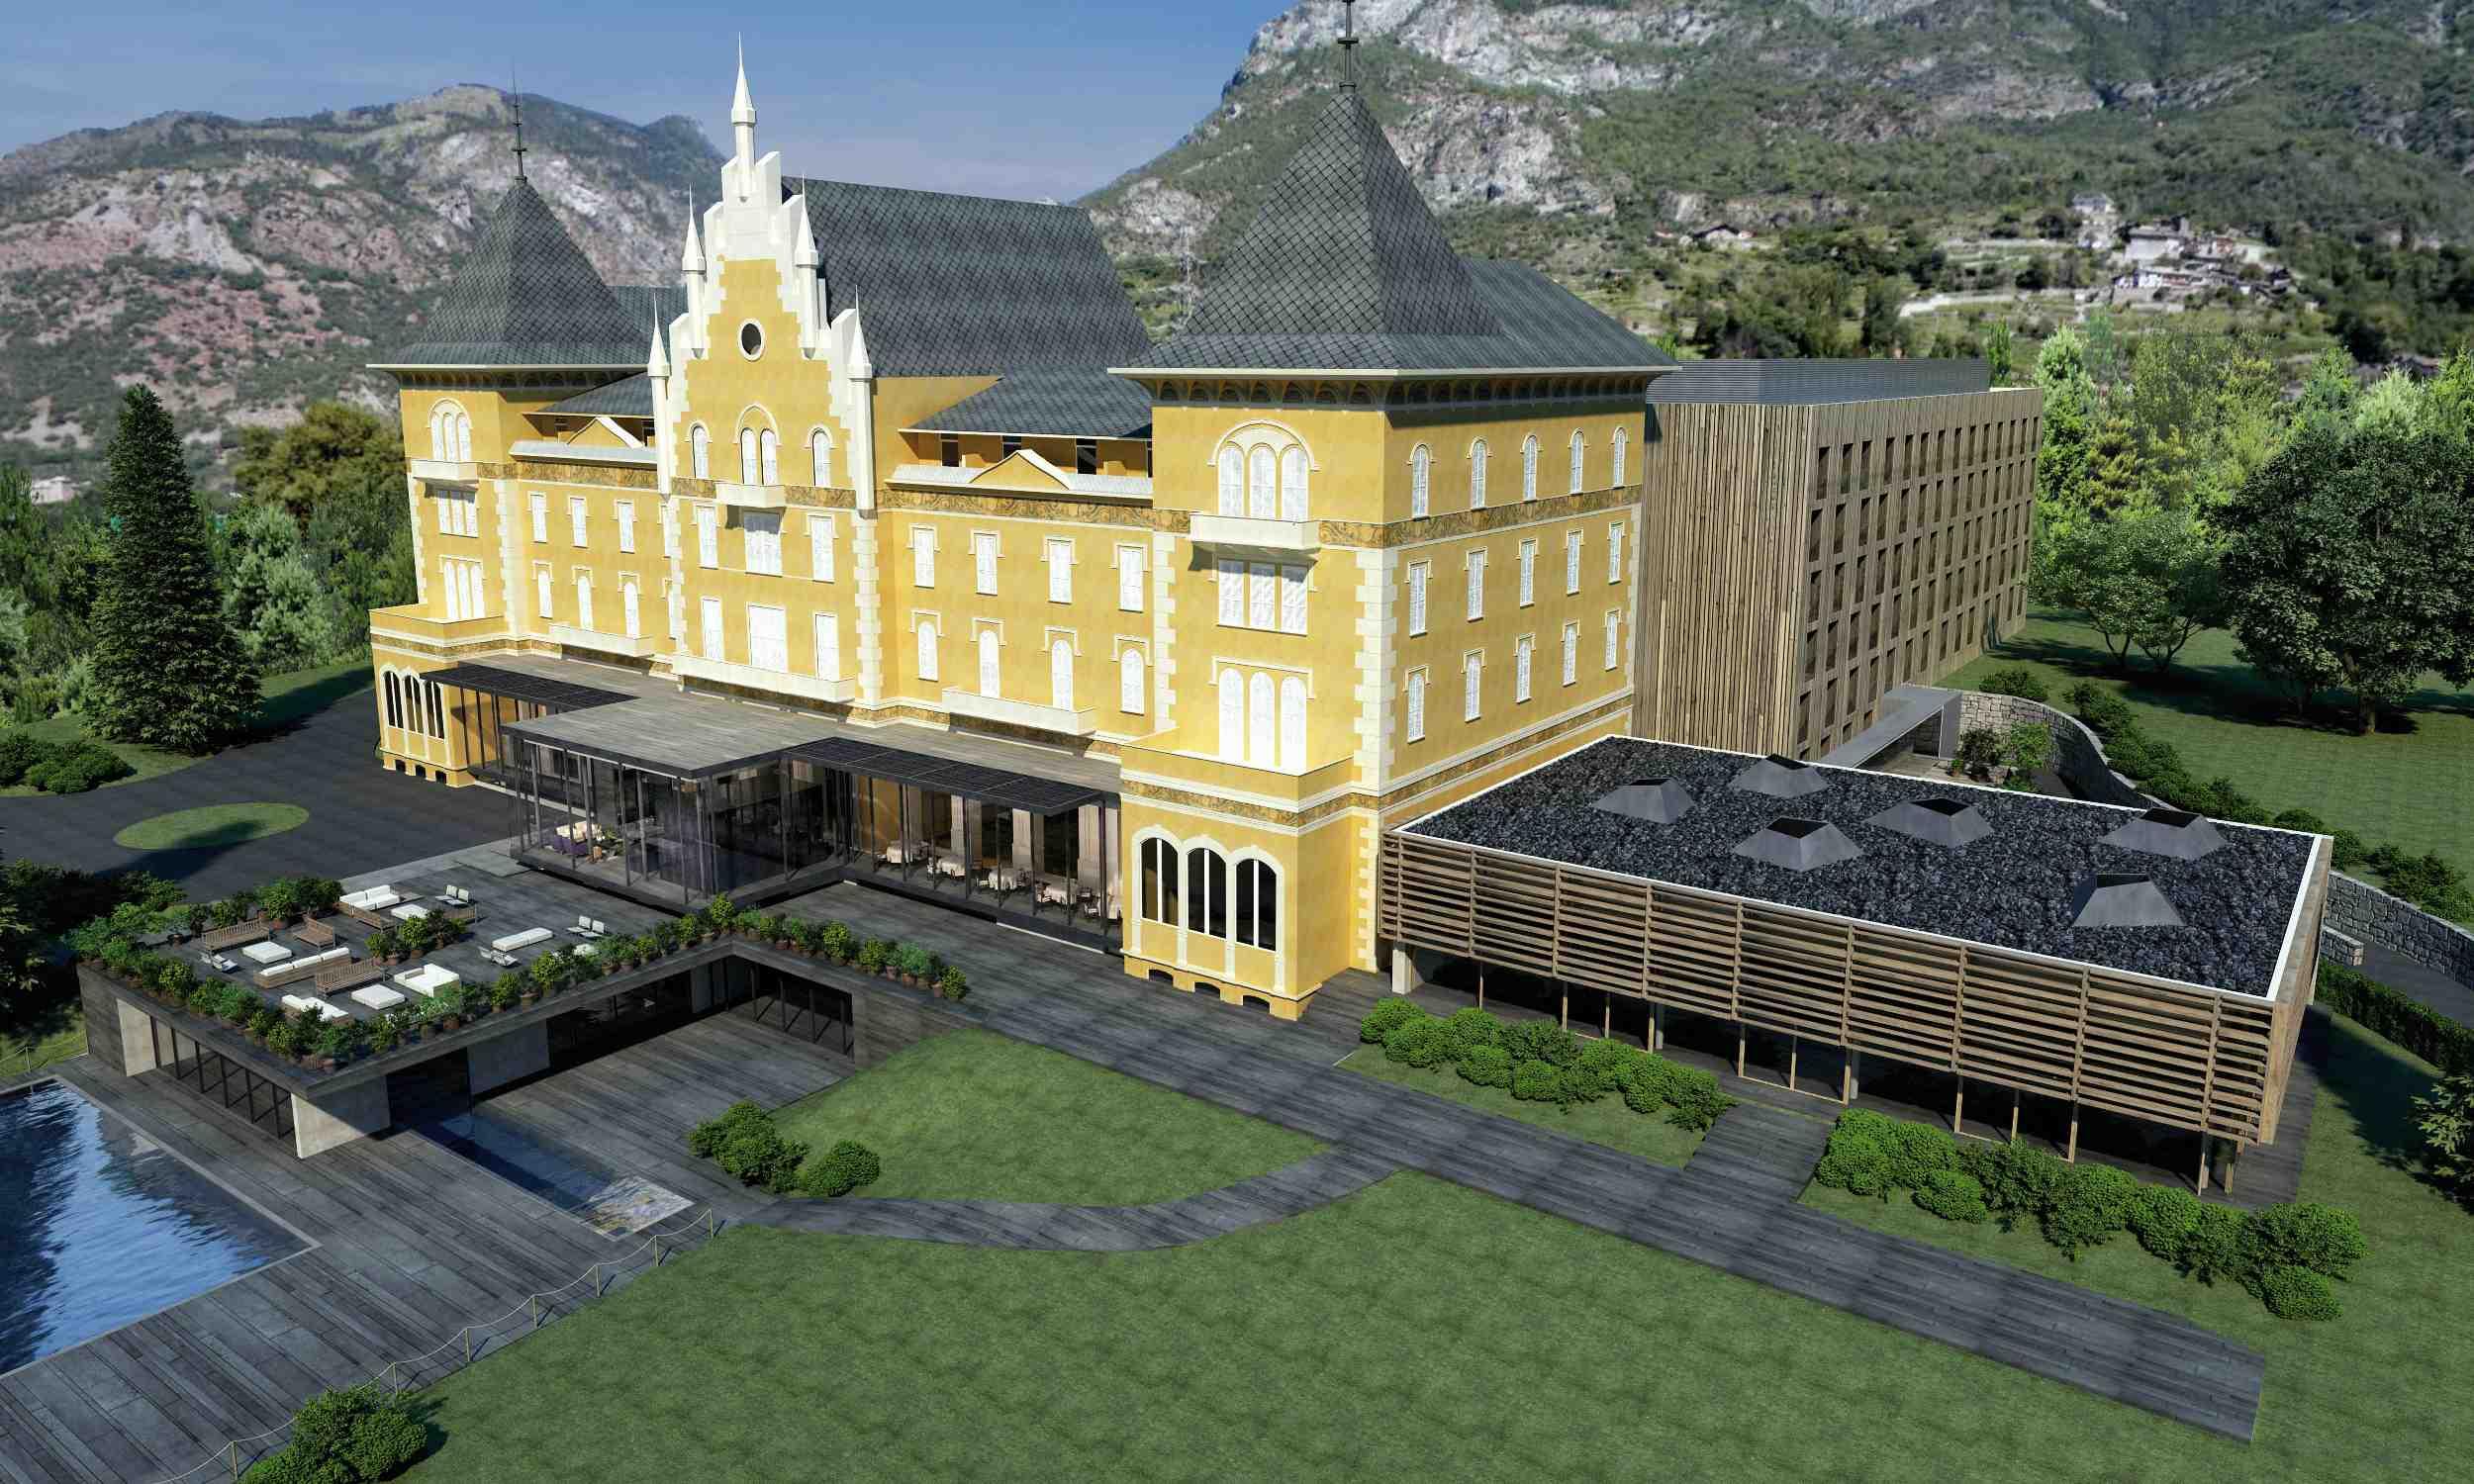 Hotel Foyer Saint Vincent : Hotels in saint vincent rouydadnews